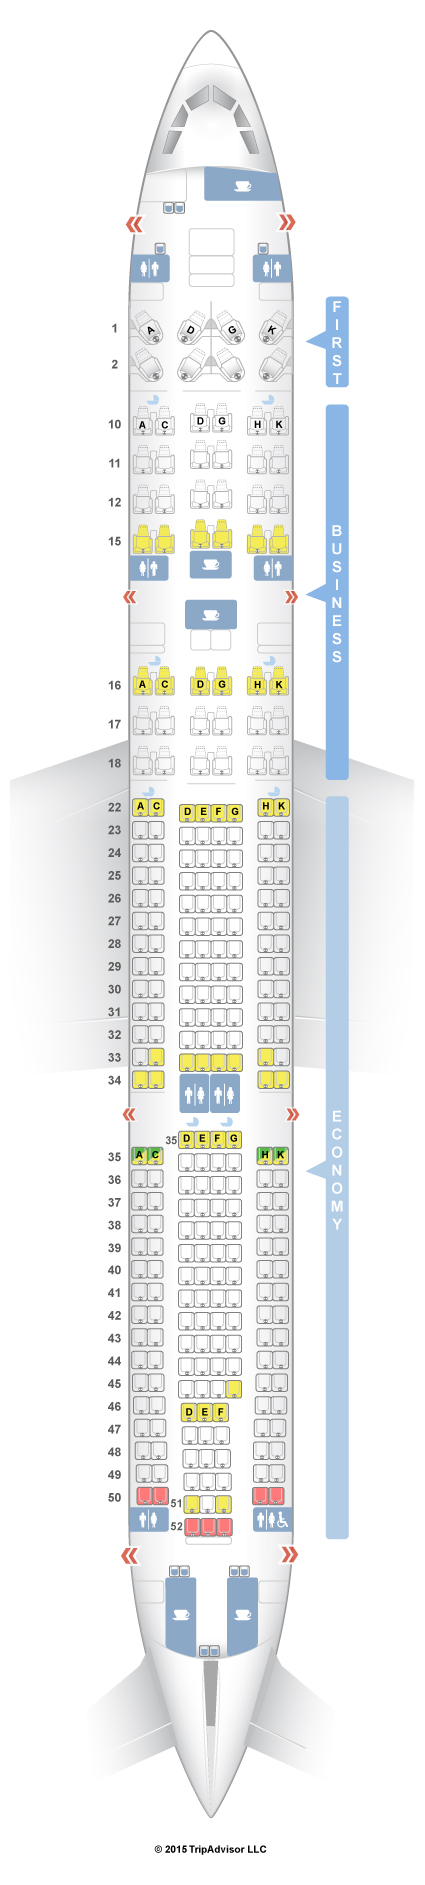 cathay pacific 333 seat map Seatguru Seat Map Iberia Airbus A330300 333 V1 Induced Info cathay pacific 333 seat map